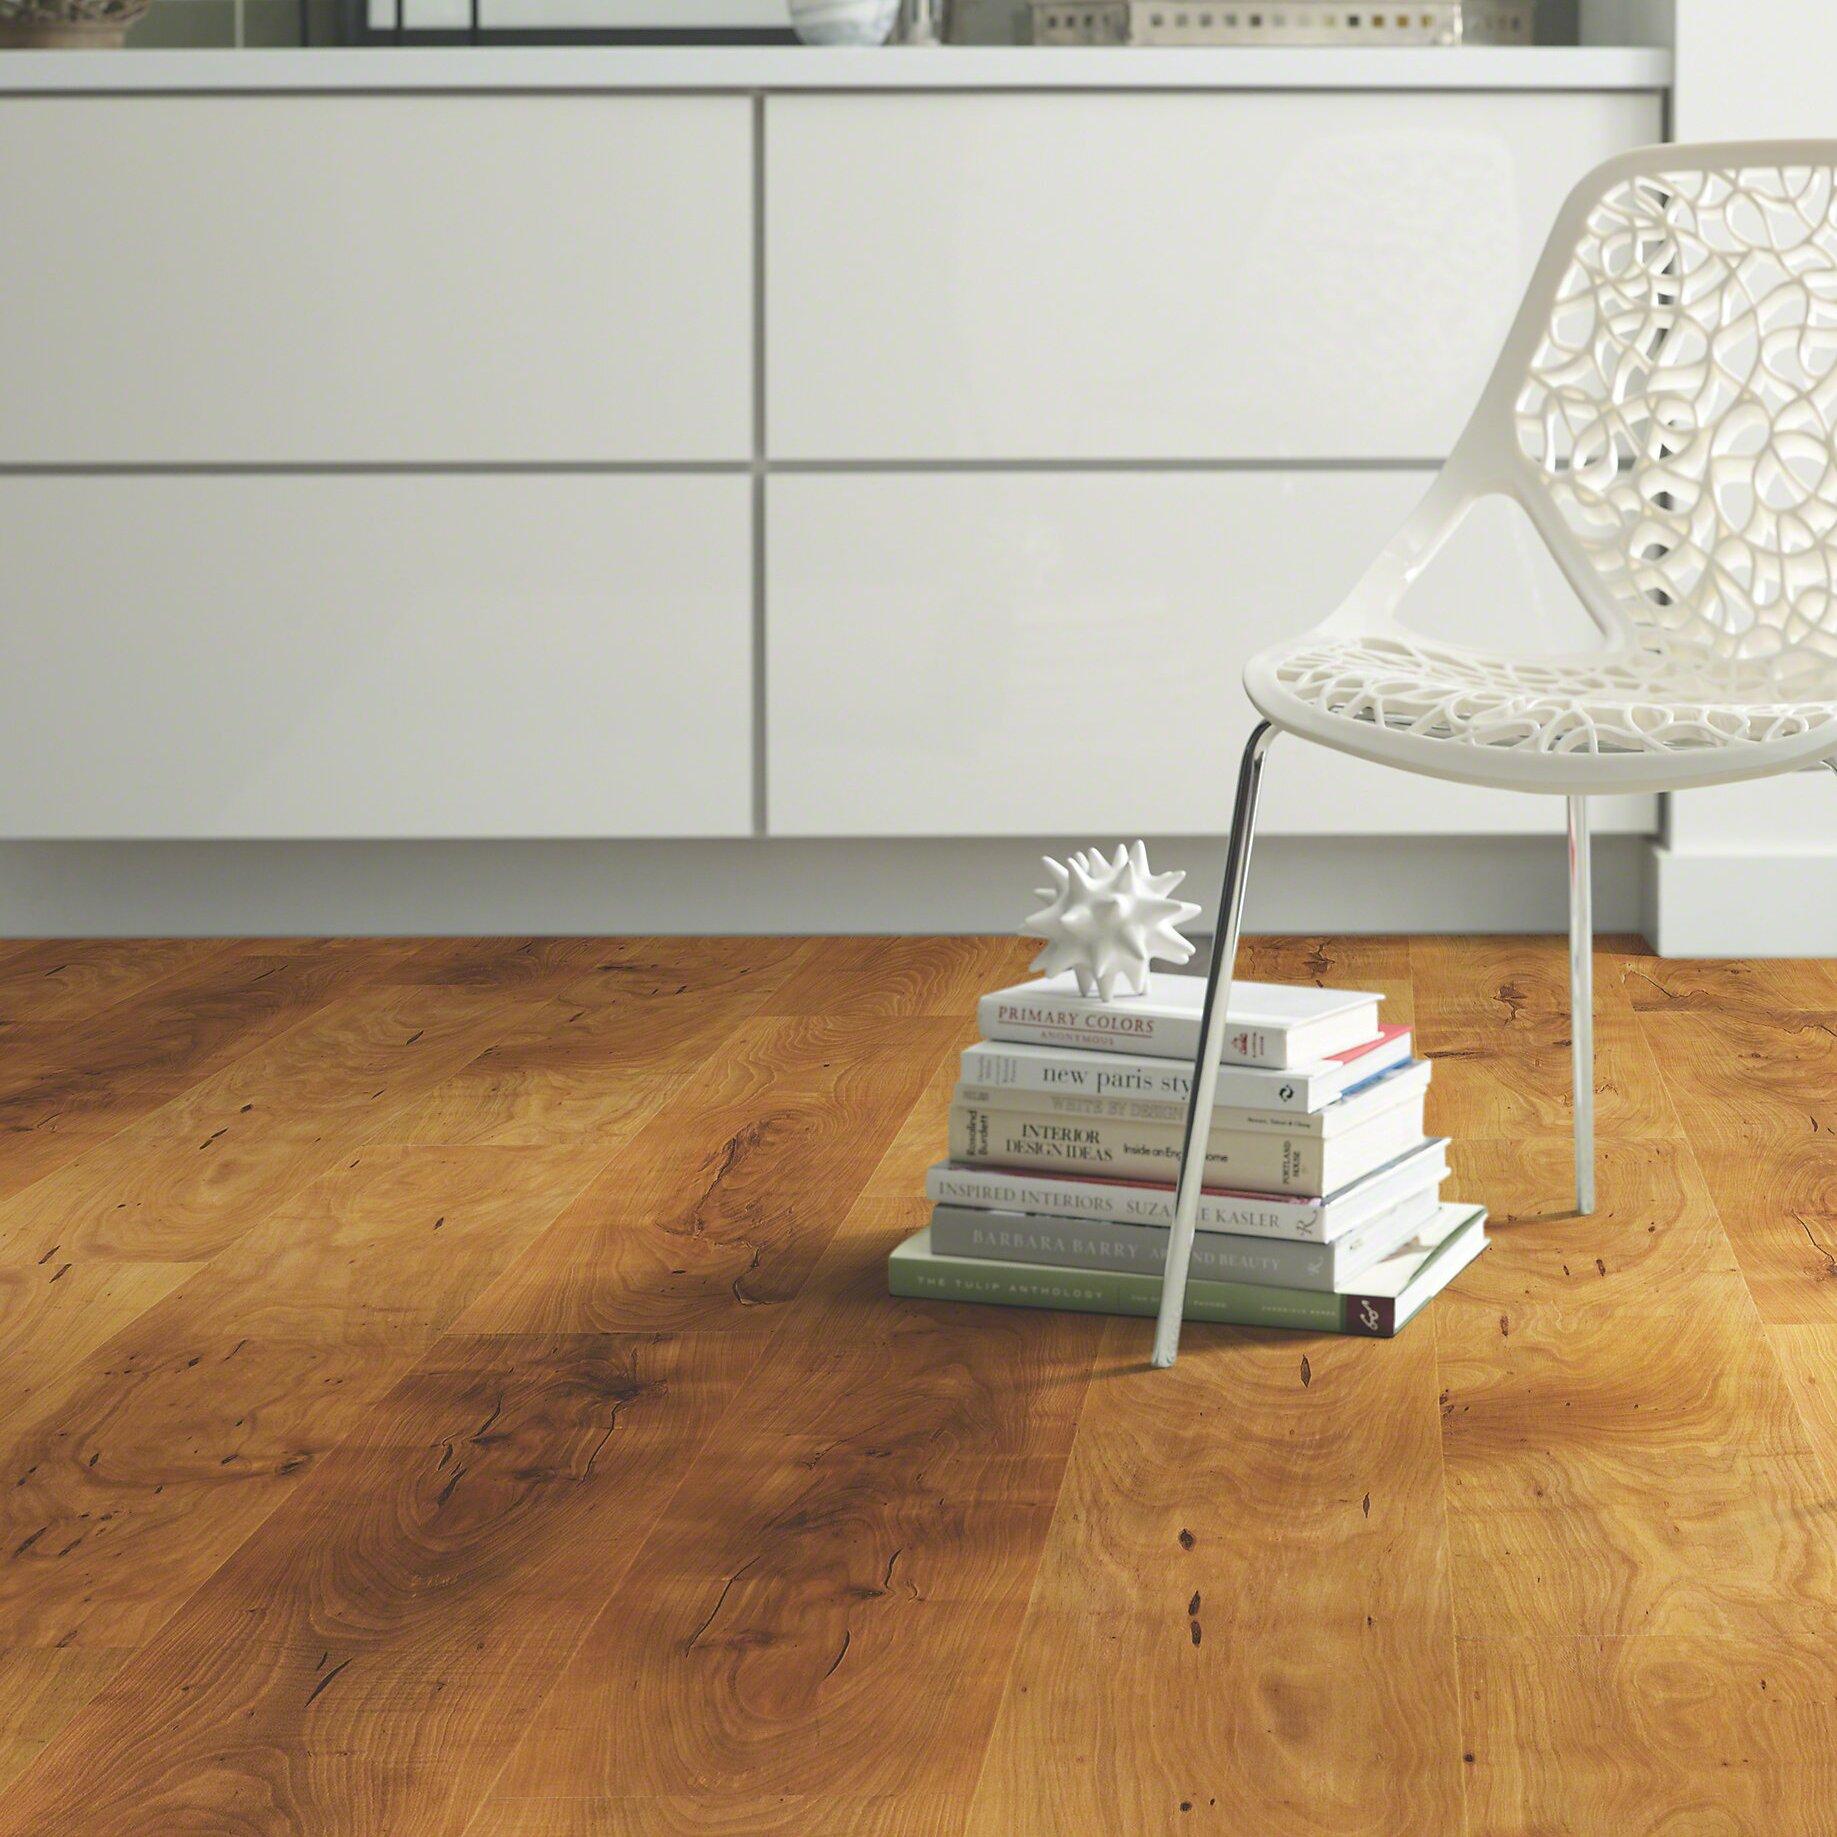 Pine Laminate Flooring xp coastal pine 10 mm thick x 4 78 in wide x Fairfax 8 X 48 X 65mm Pine Laminate